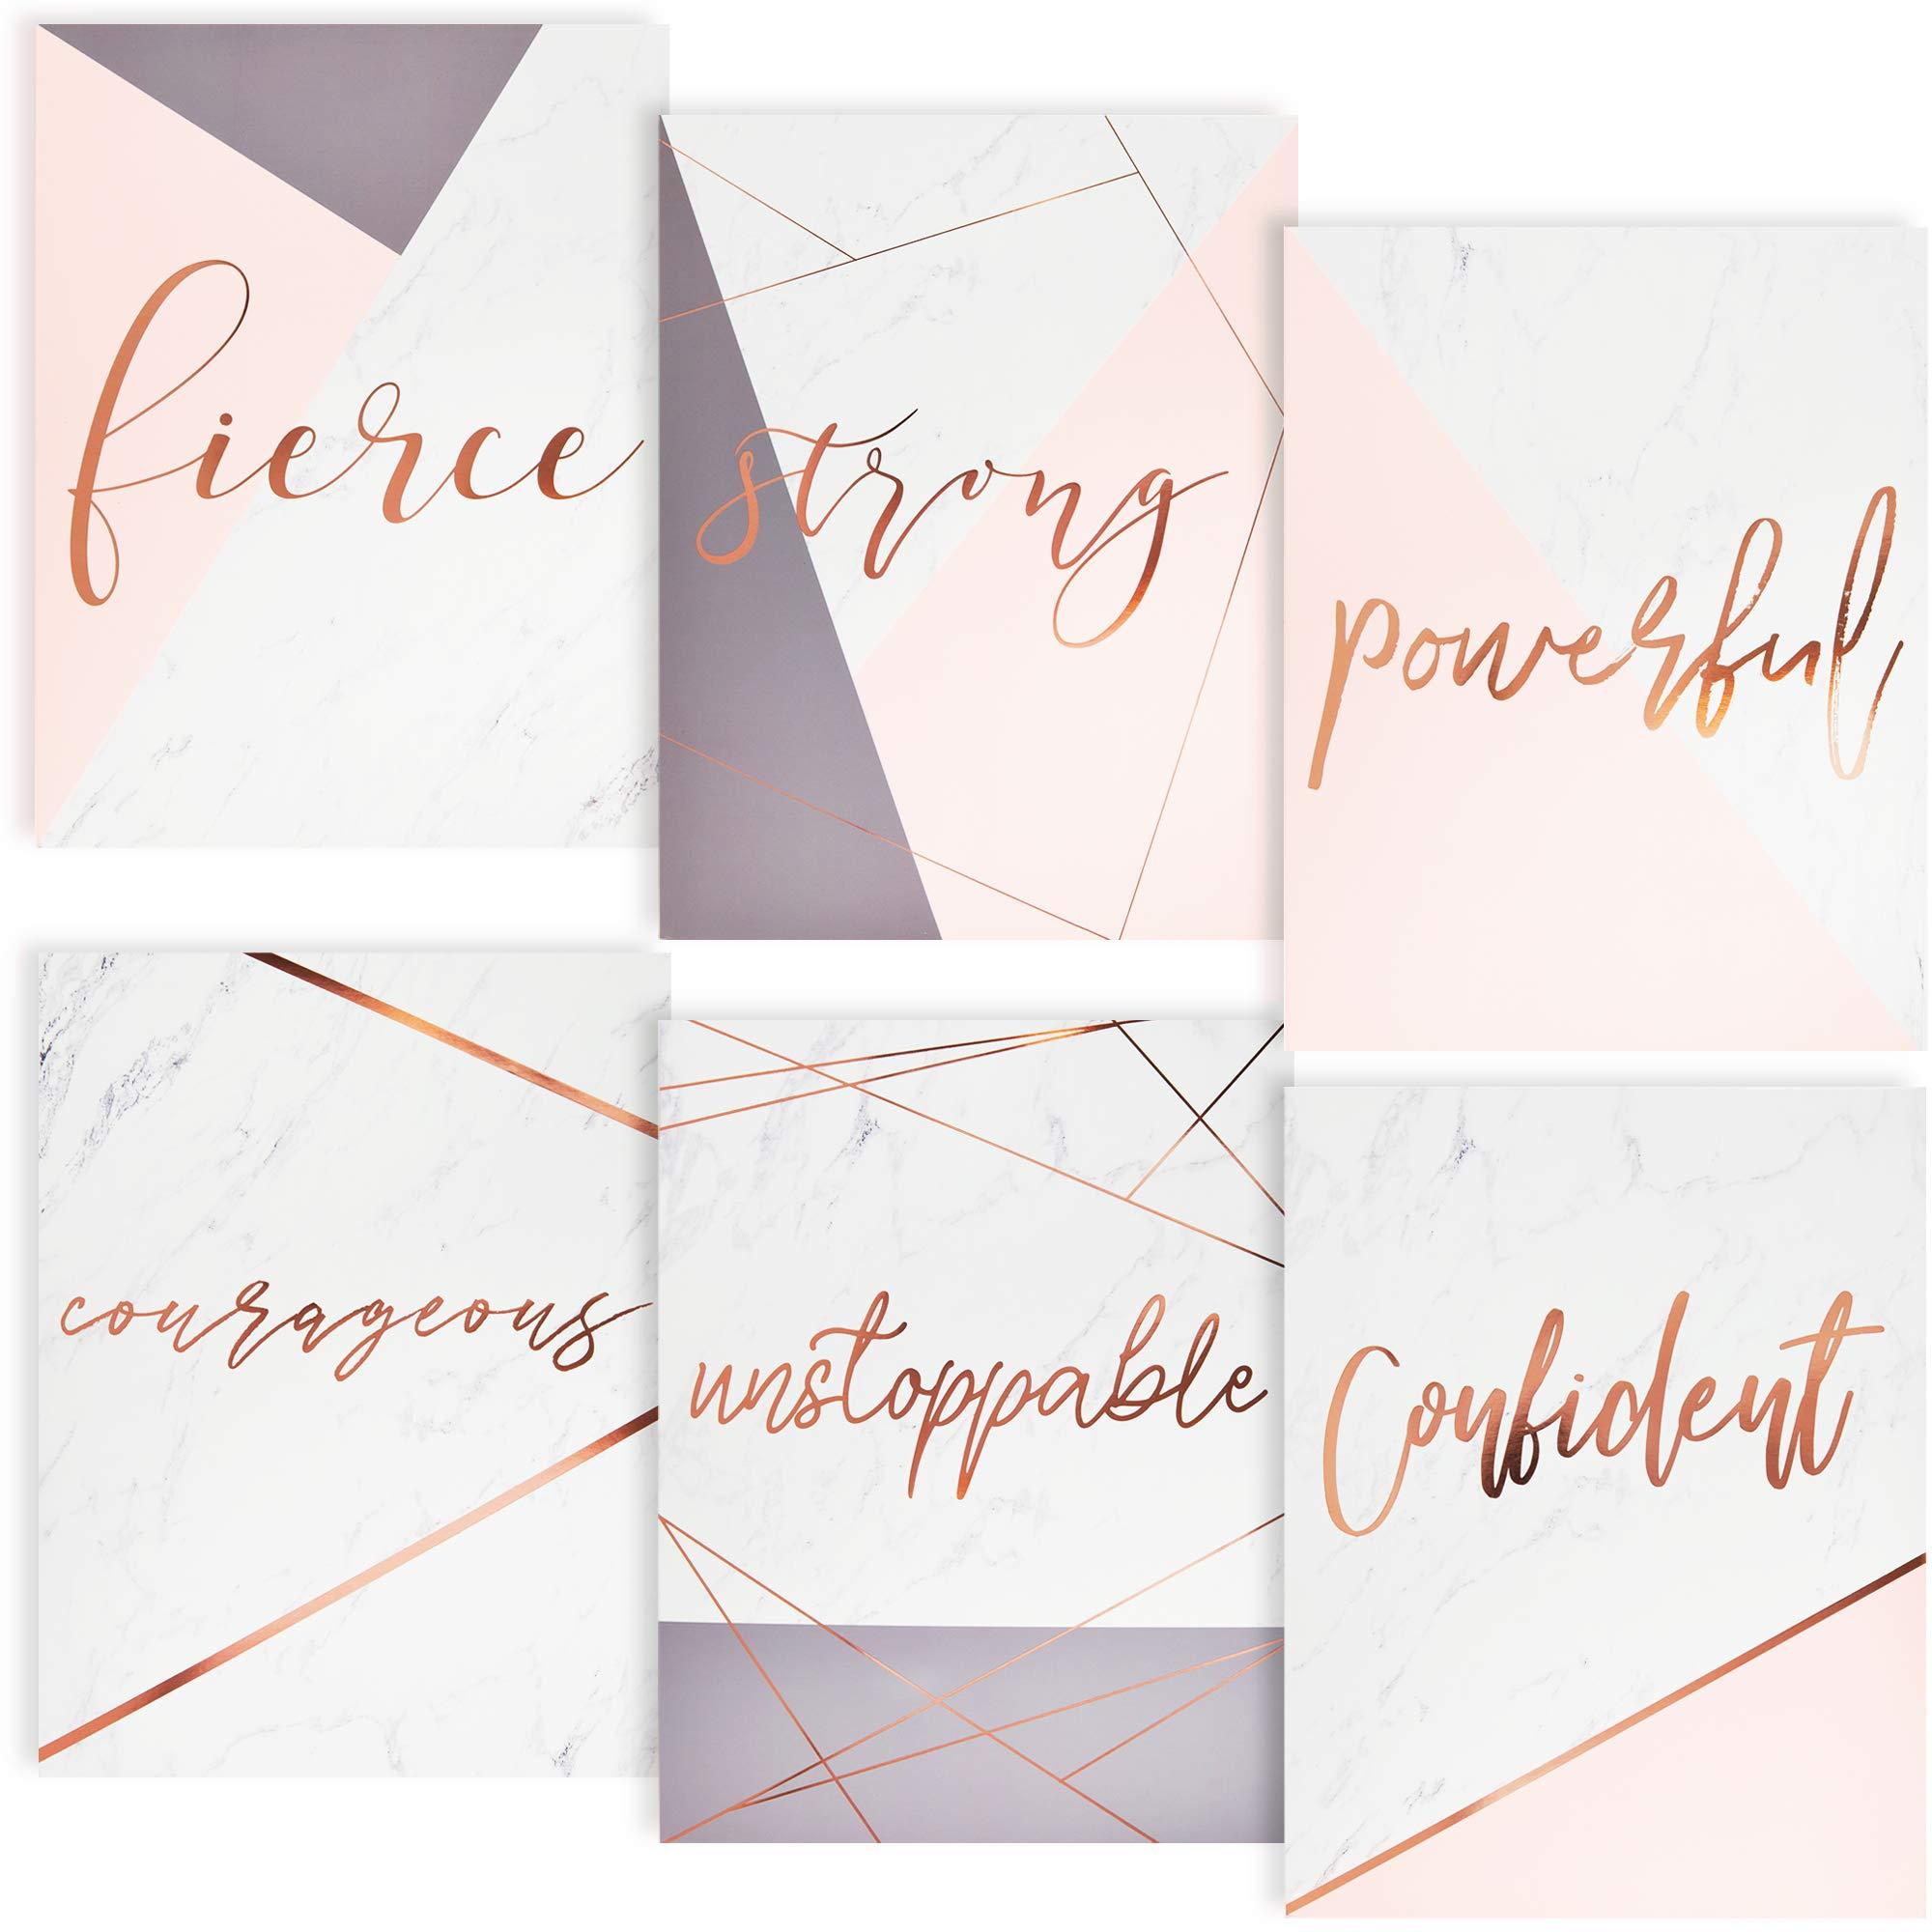 Paper Junkie Pocket Folders with Rose Gold Foil Motivational Sayings (12 Pack), 6 Designs by Paper Junkie